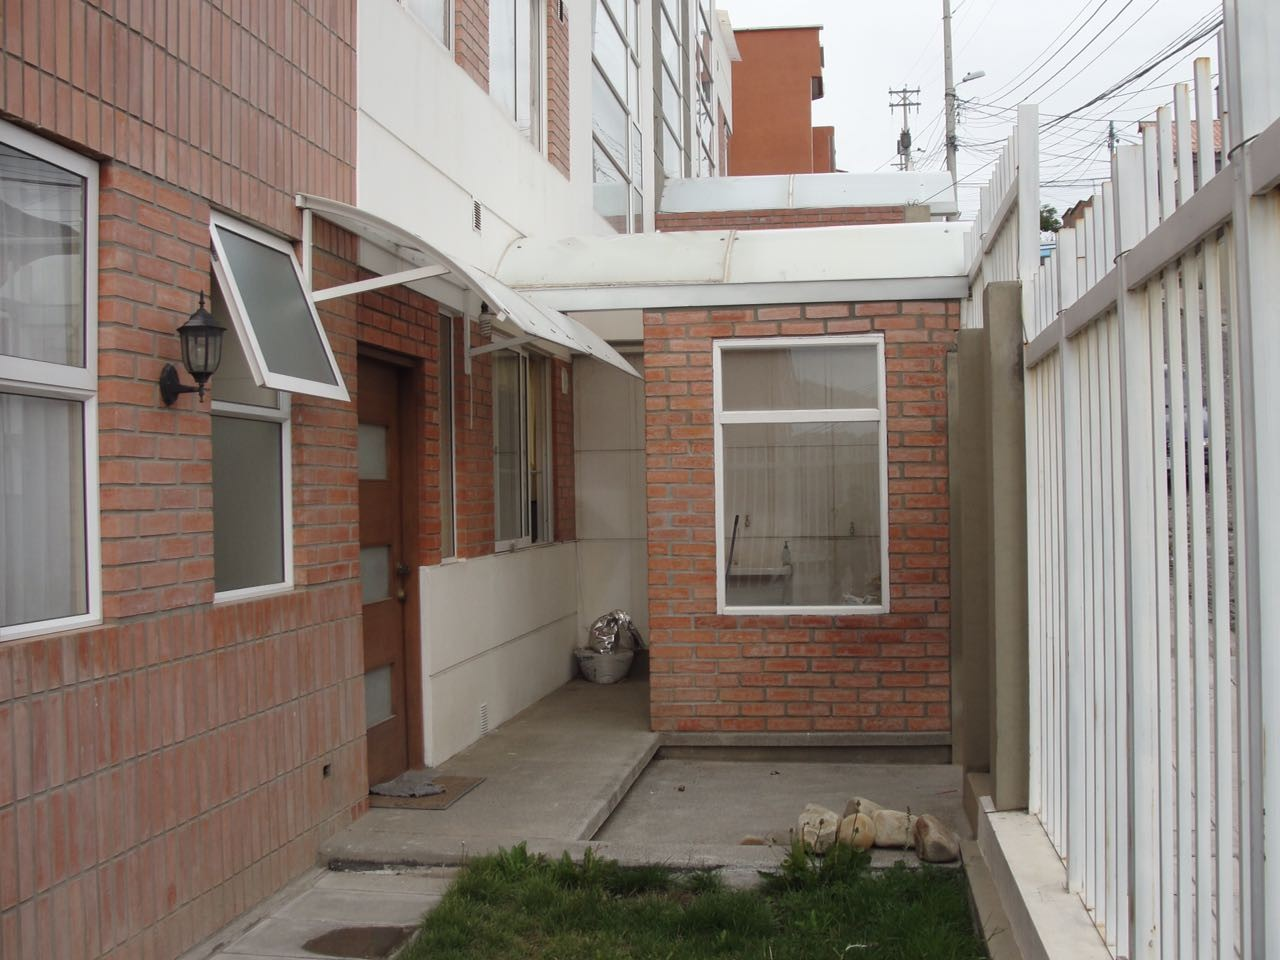 Departamento en Alquiler COTA COTA, BONITO DEPARTAMENTO EN ALQUILER Foto 6